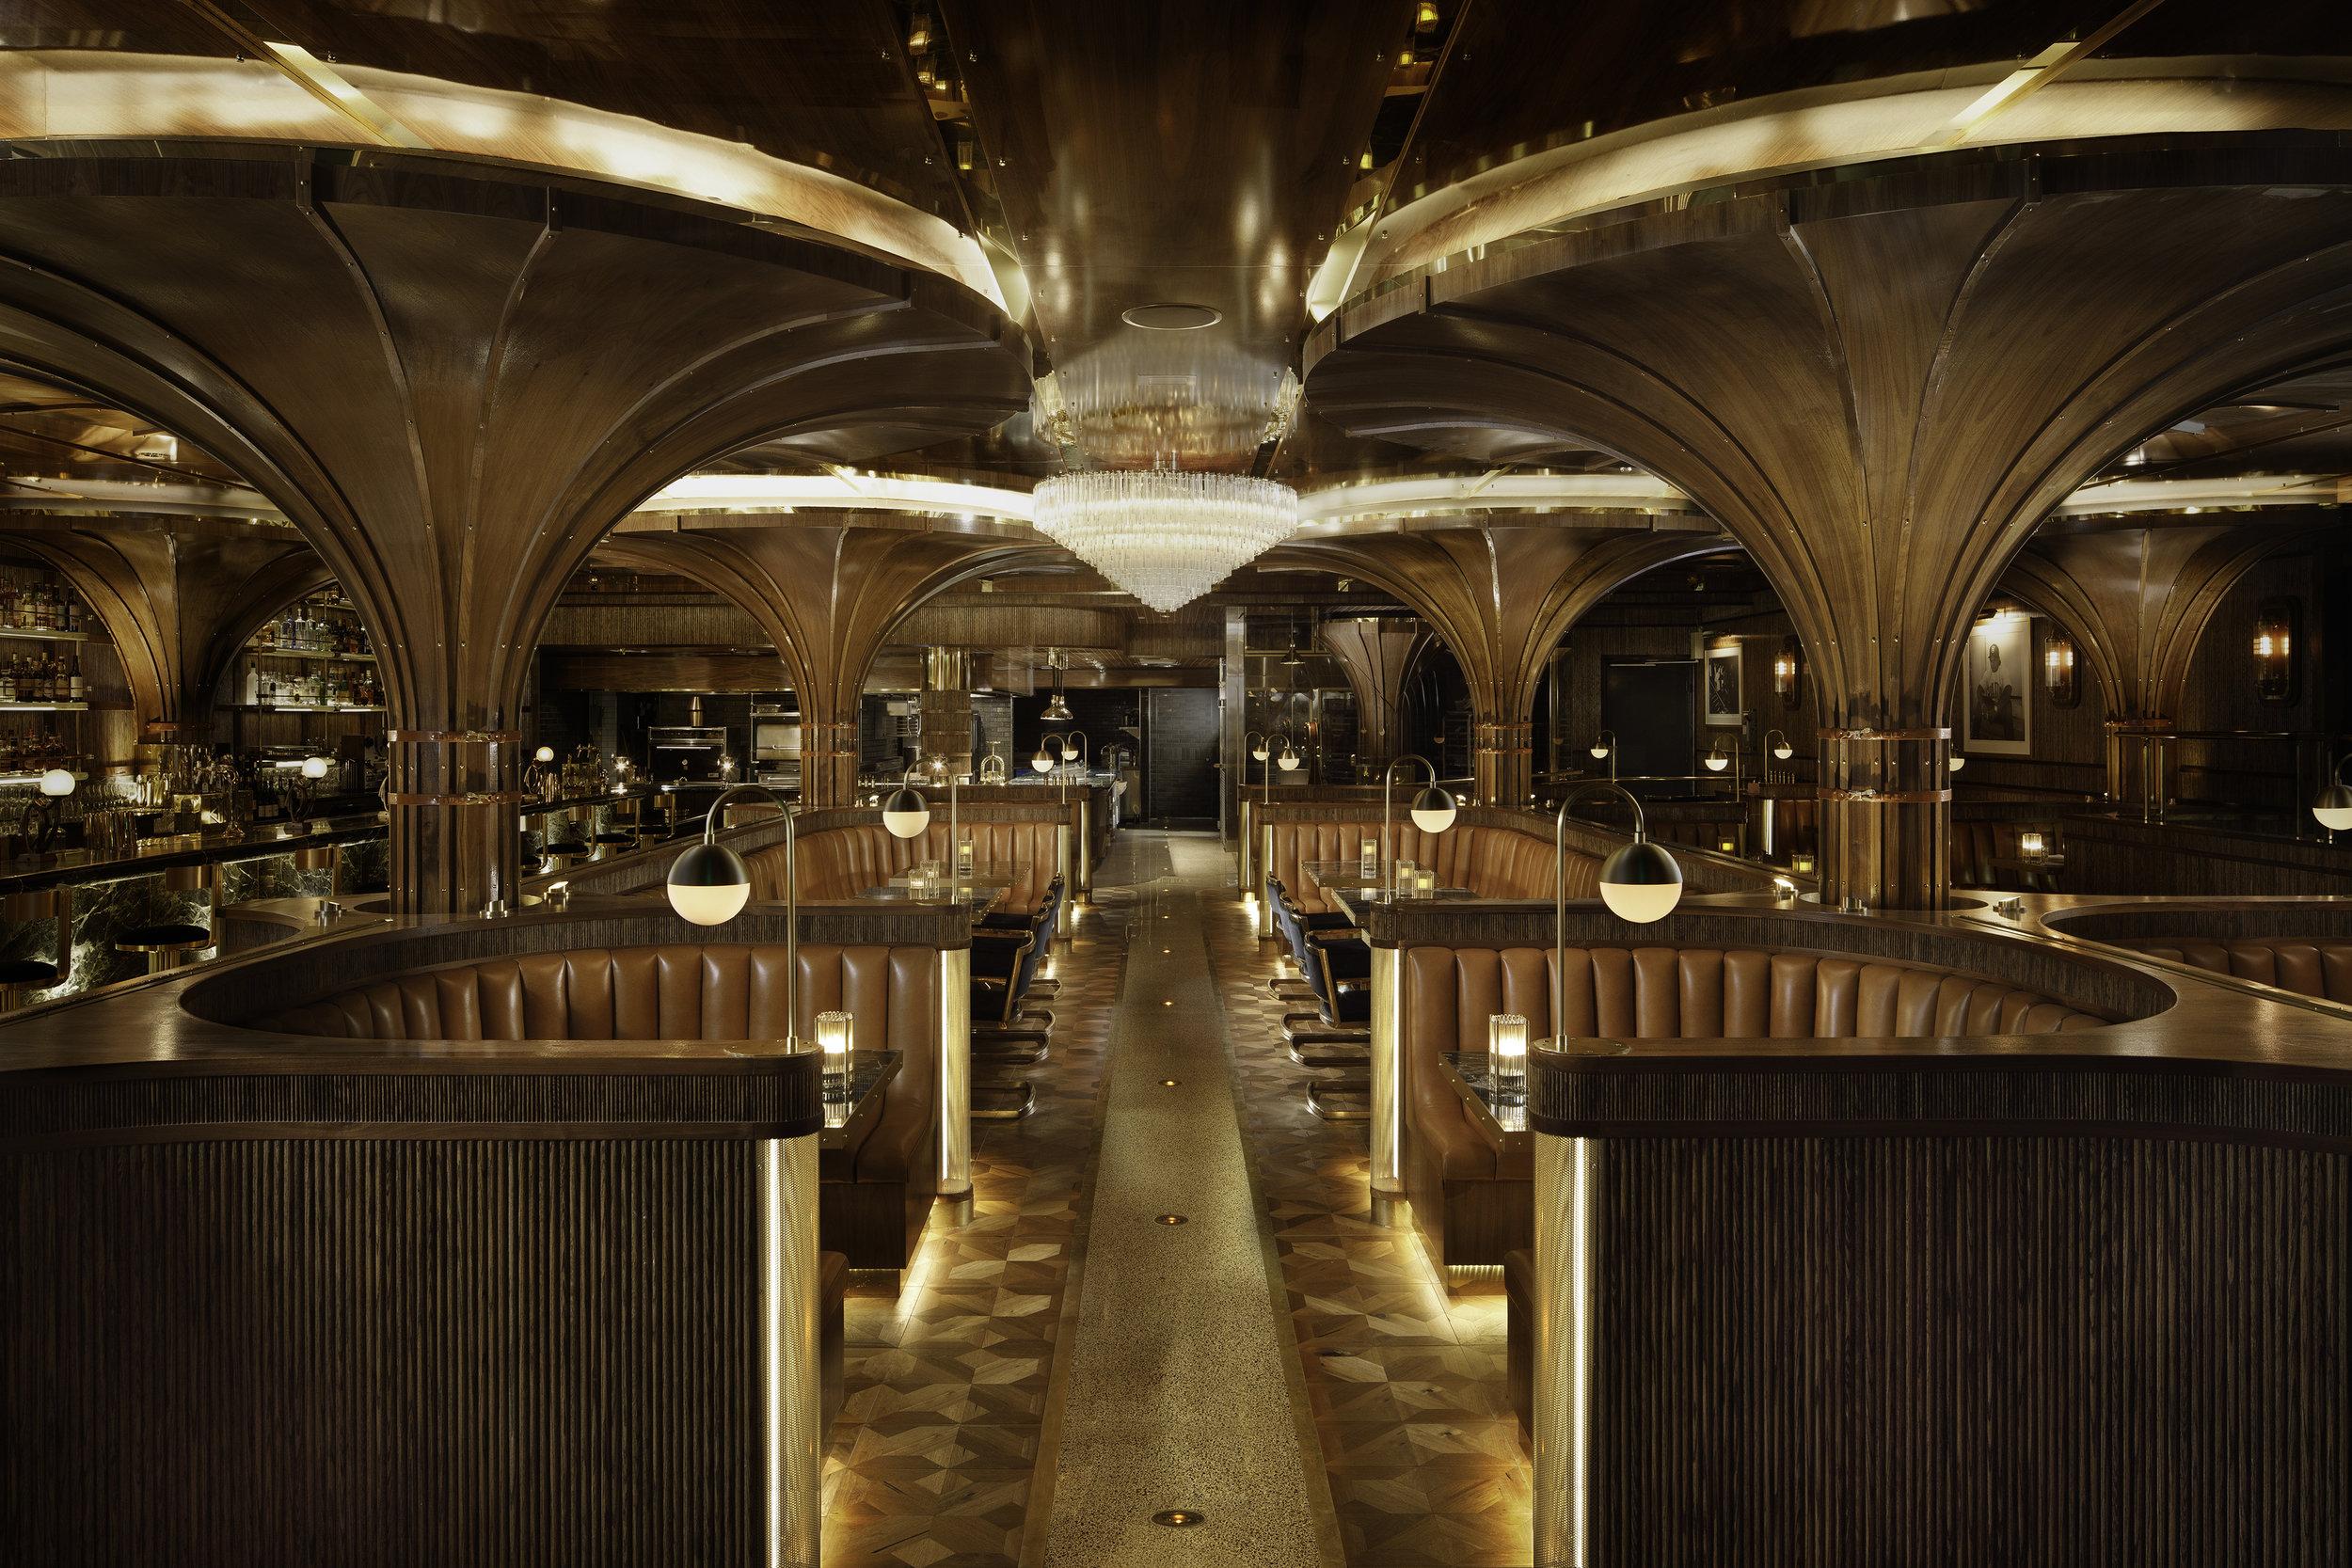 B&R_expansive interior_robertbenson.jpg